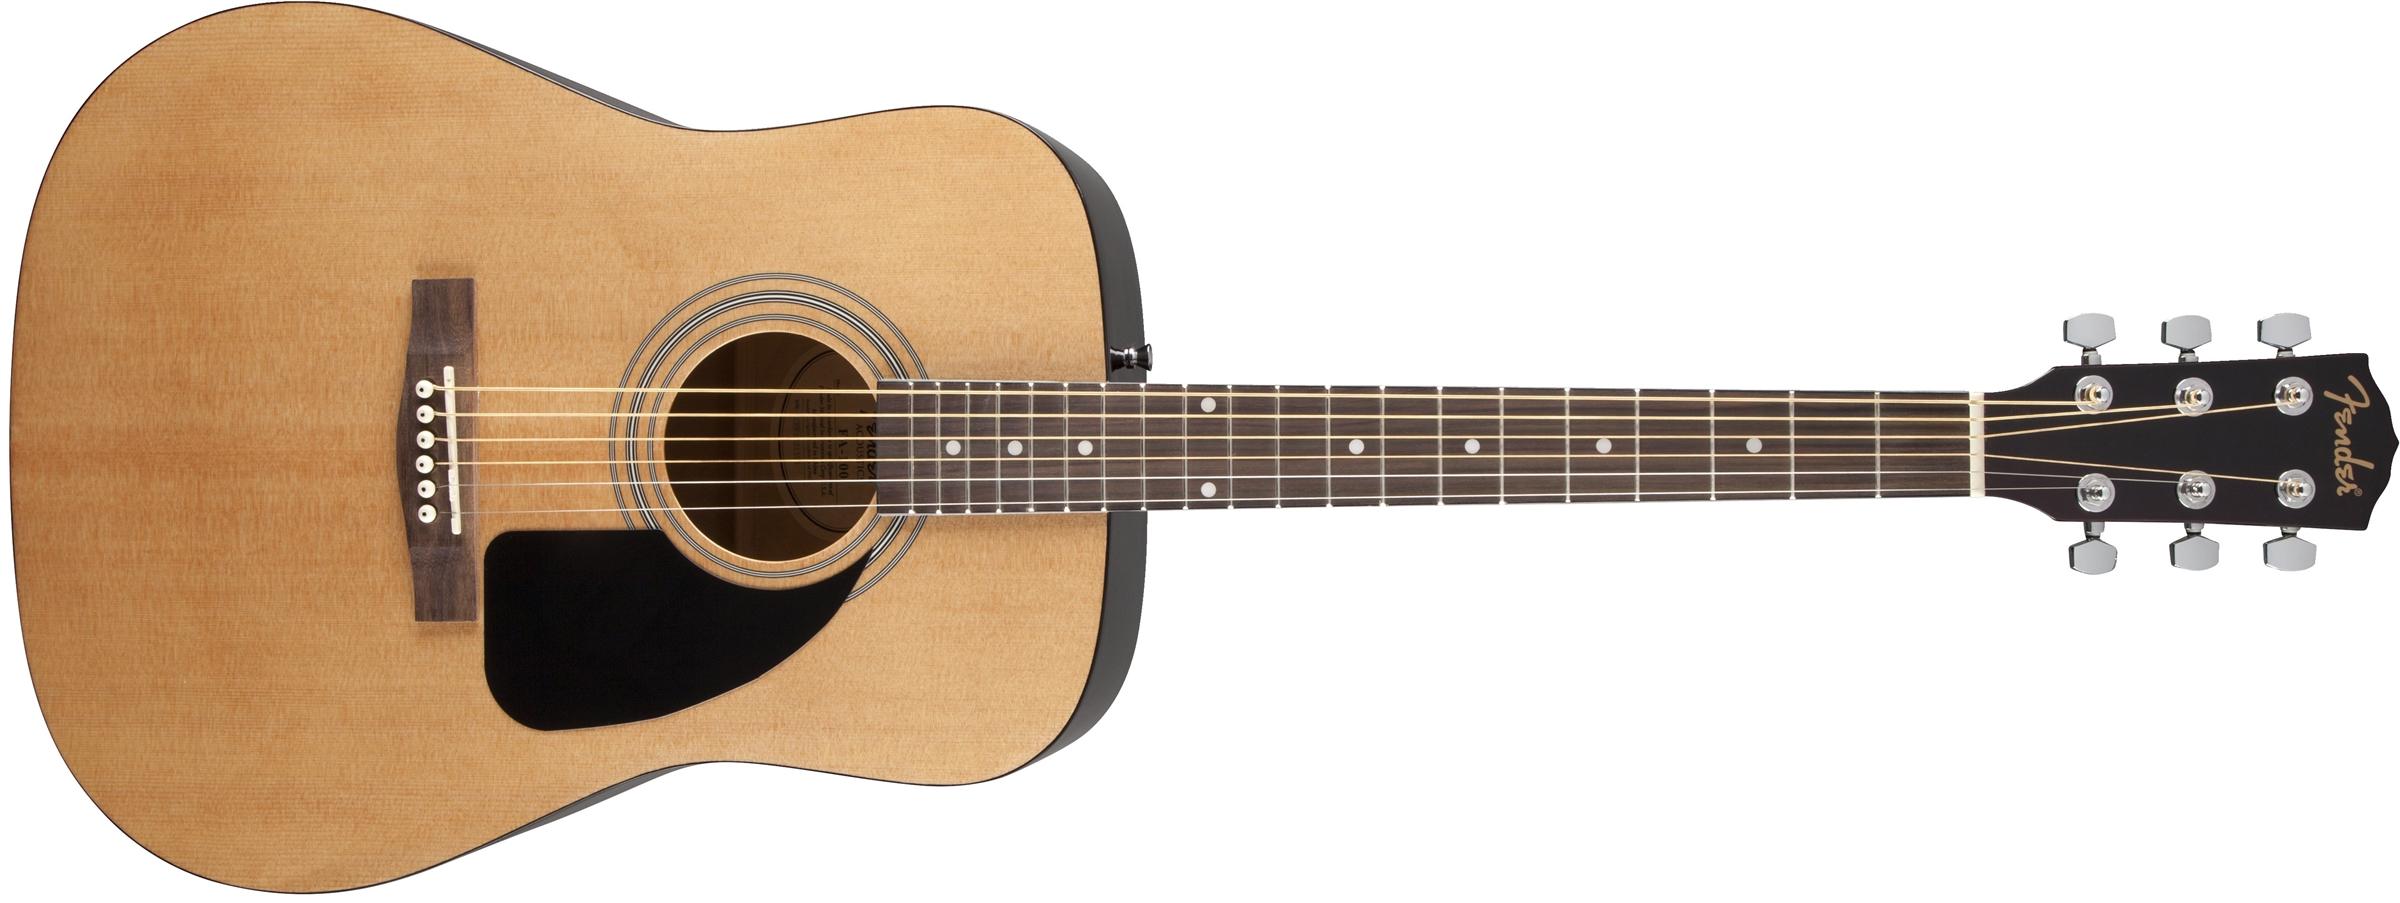 7398048447 FA-100 Acoustic Pack | Acoustic Guitars